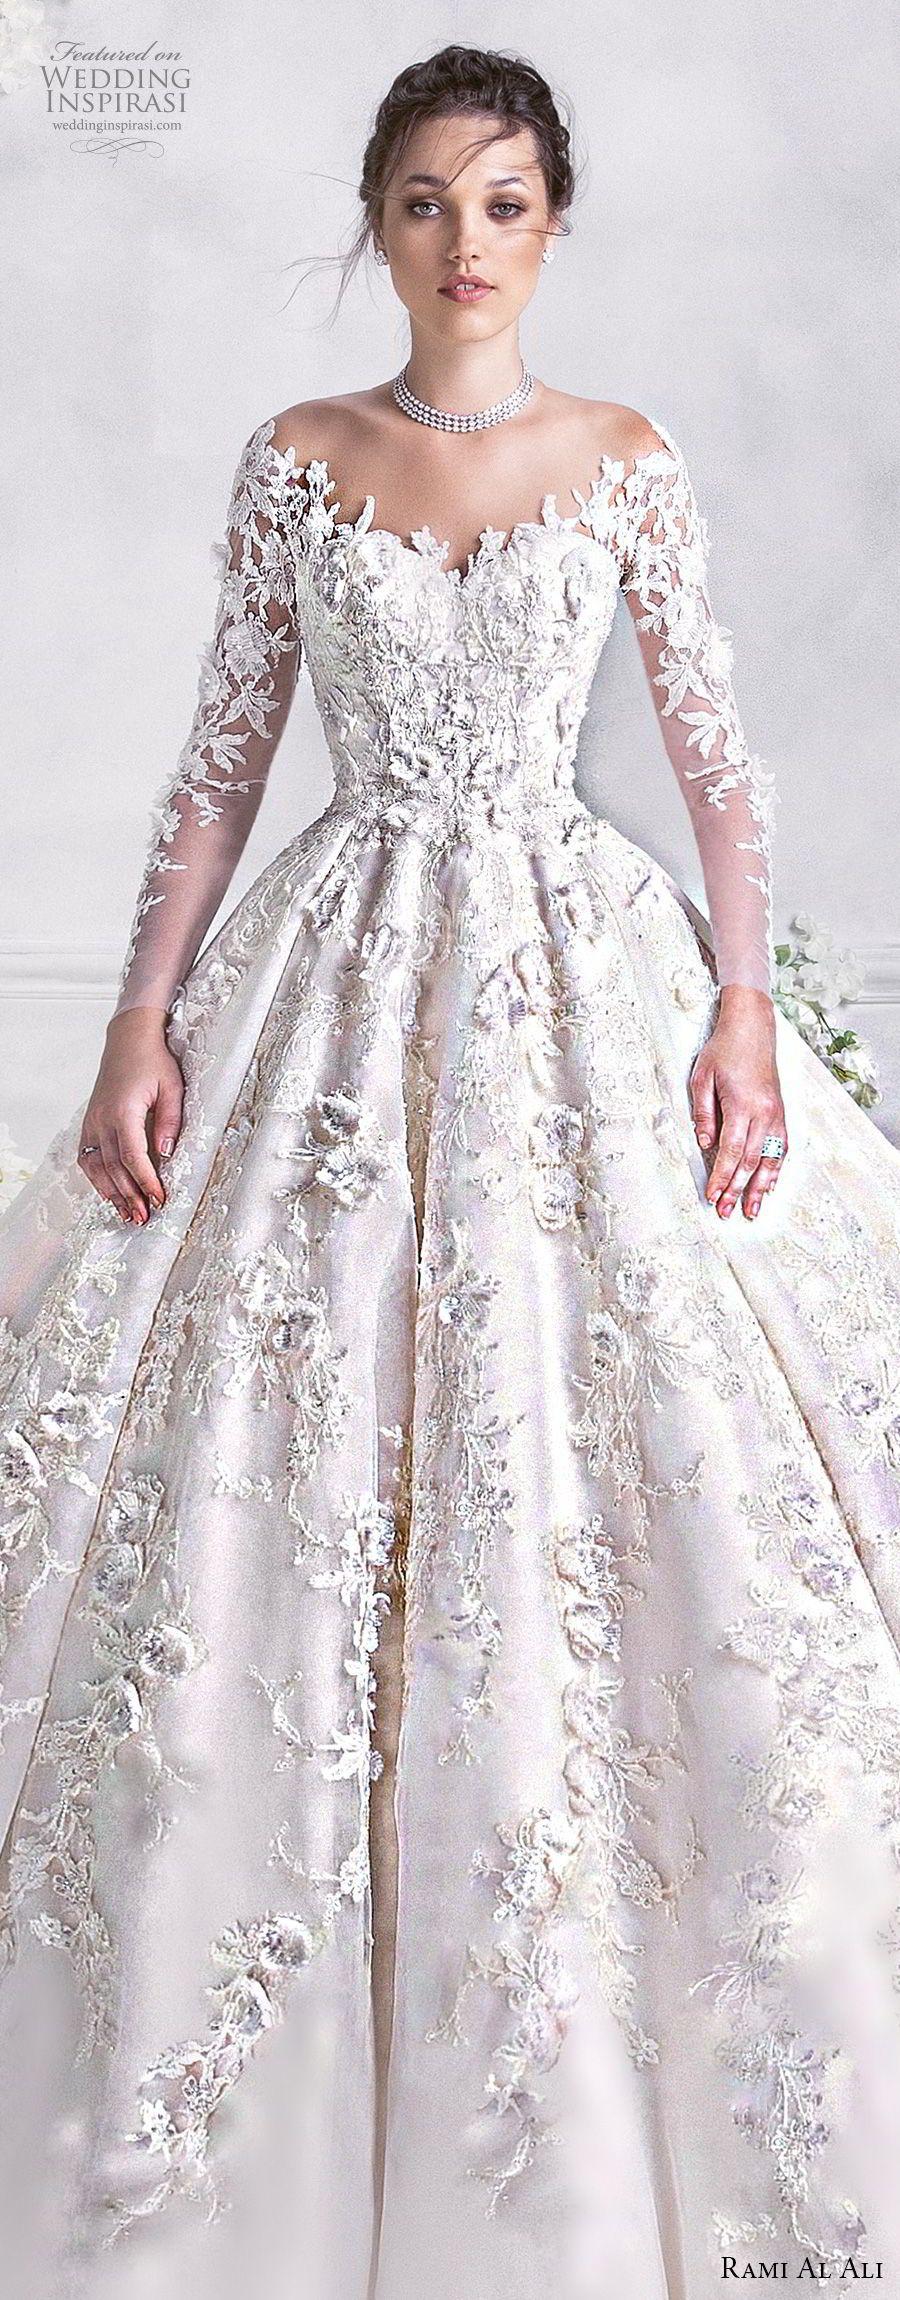 Rami al ali wedding dresses ball gowns neckline and wedding